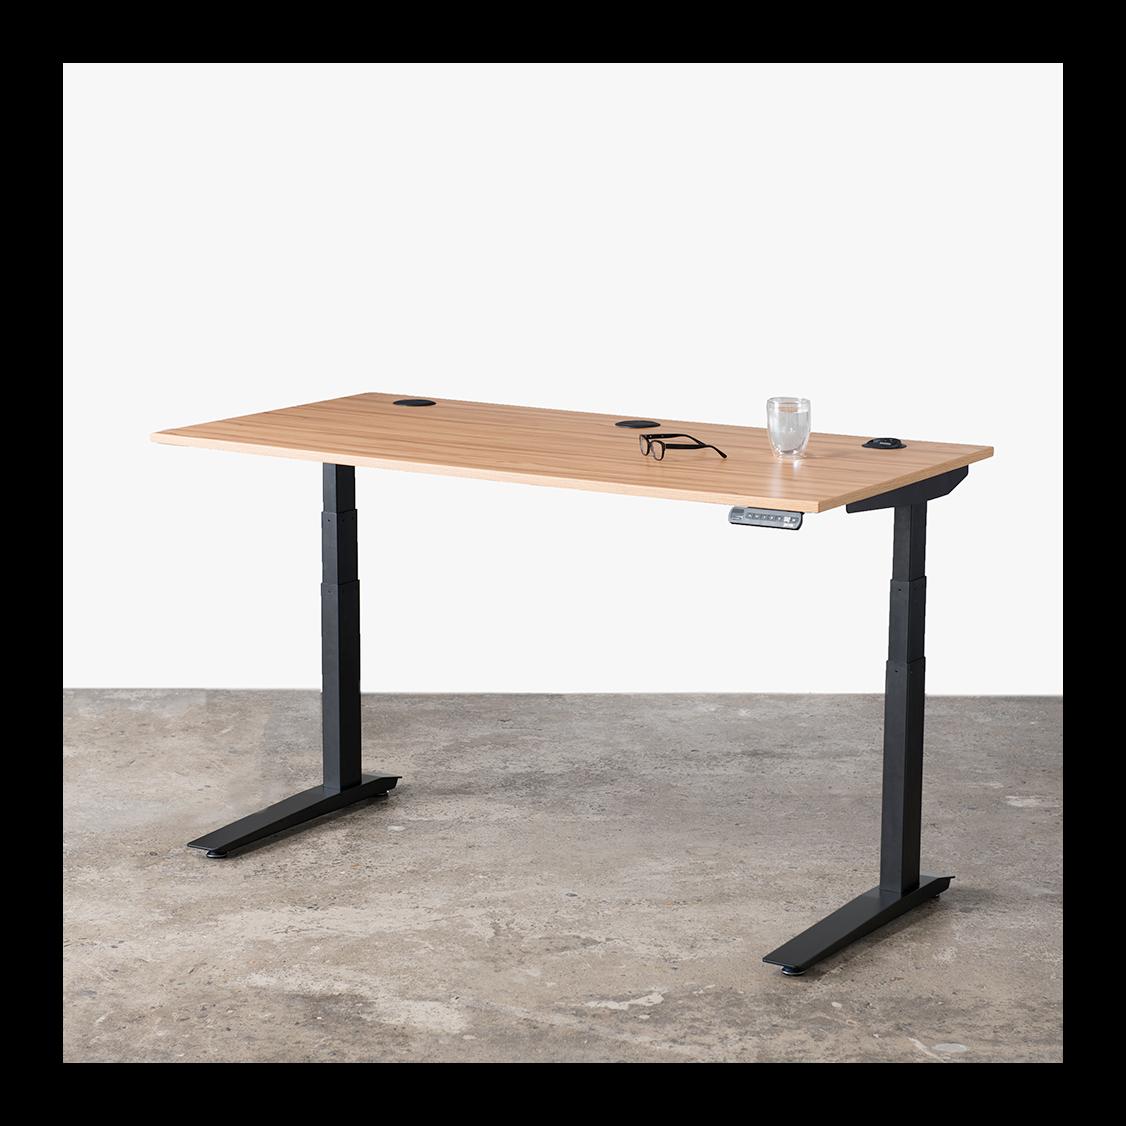 Astonishing Jarvis Laminate Standing Desk Ergo Depot Products Desk Download Free Architecture Designs Xaembritishbridgeorg